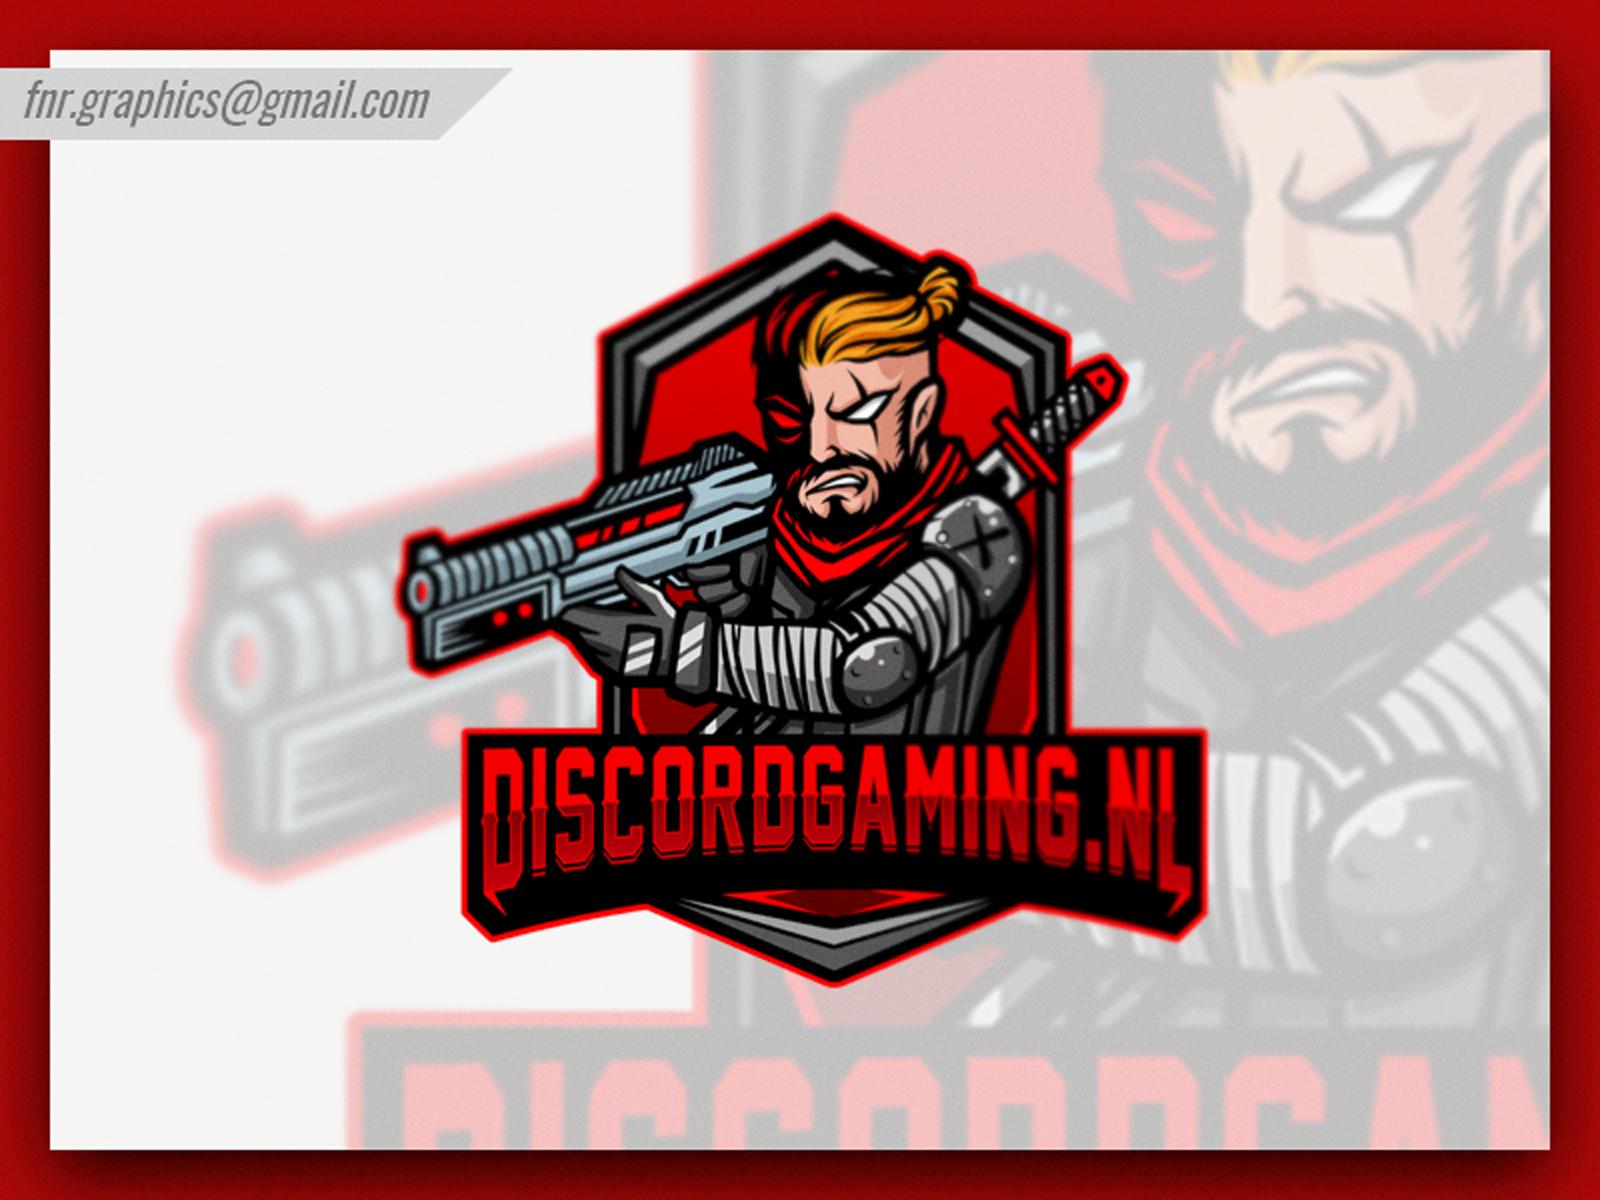 Discord Gaming Esport Logo Discord Game Mascot Ninja Art